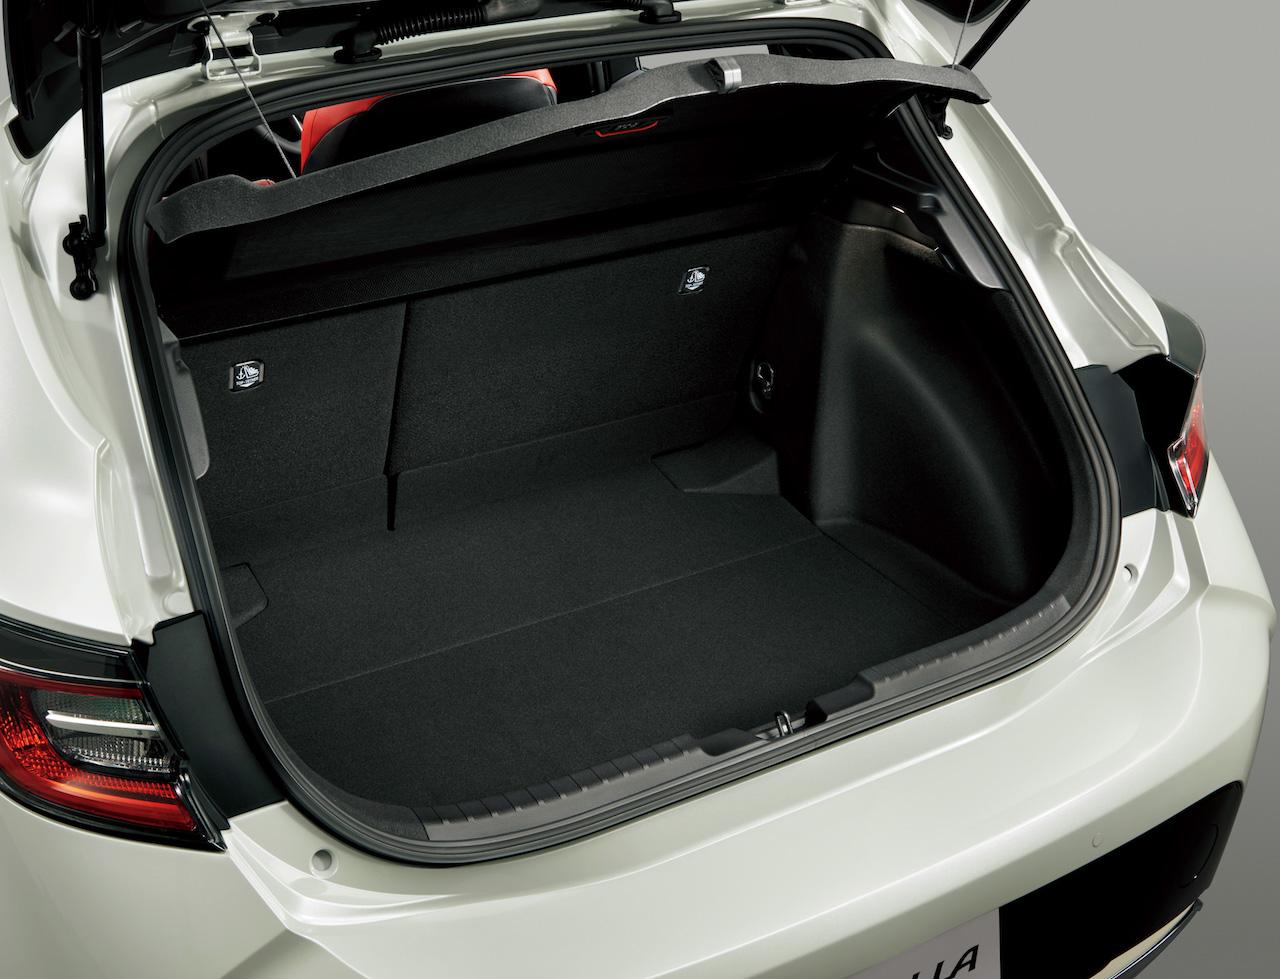 2018 Toyota Corolla Hatchback (Toyota Corolla Sport) boot